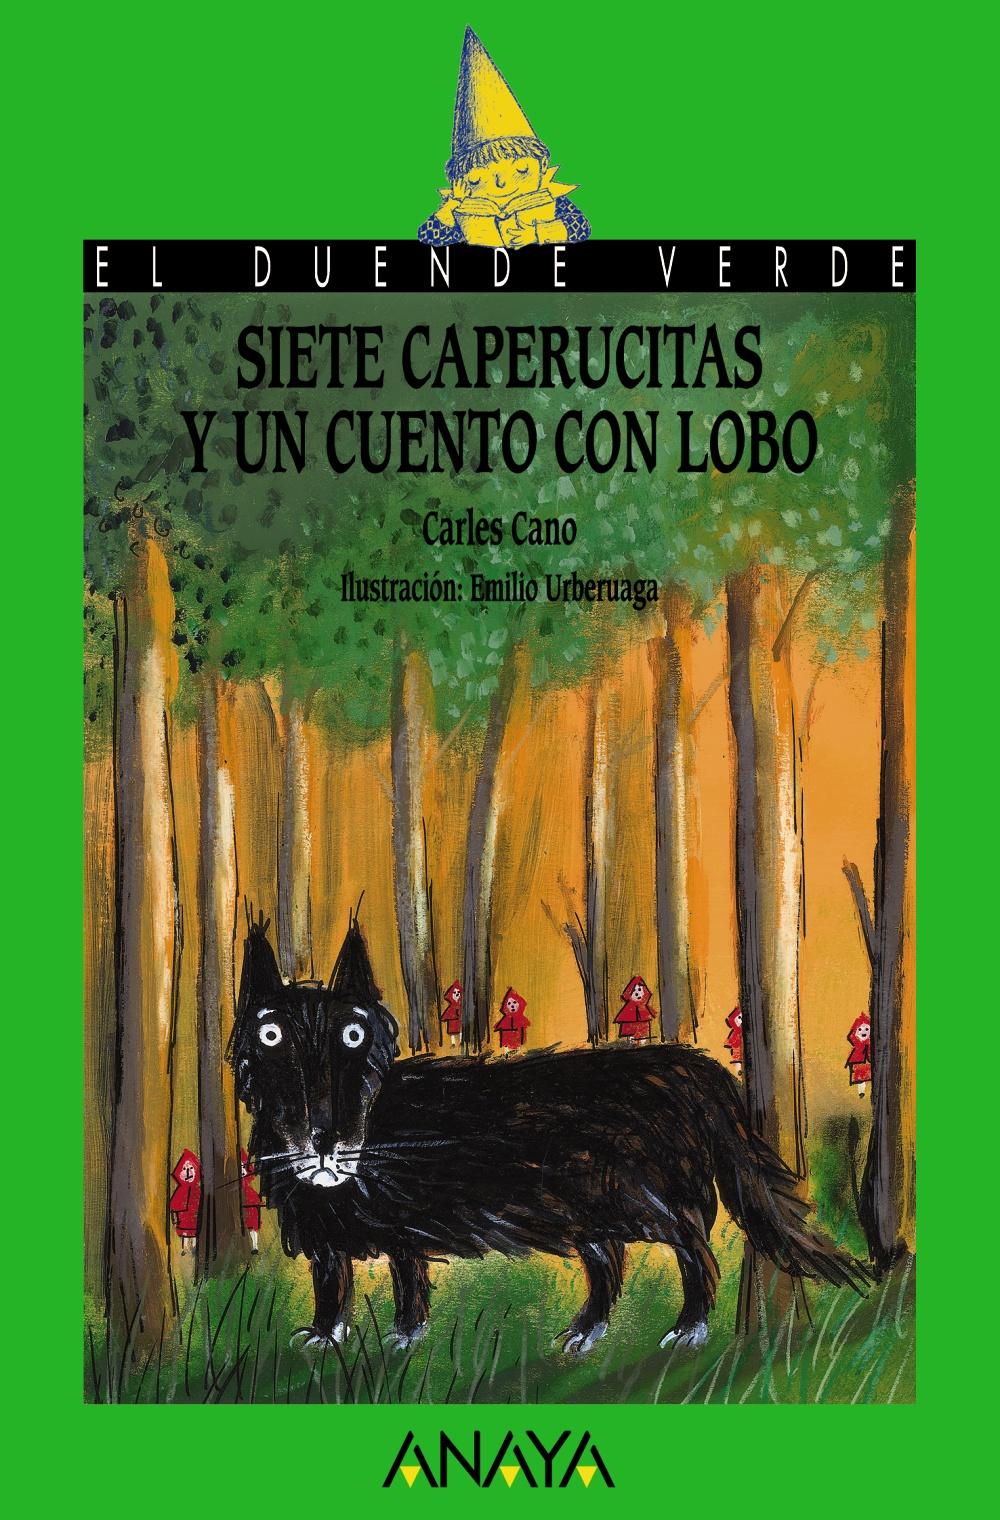 Caperucita Roja La Abuelita Y El Lobo Pelicula Porno grupo leo - alicante. xxx aniversario 1985-2015: septiembre 2016